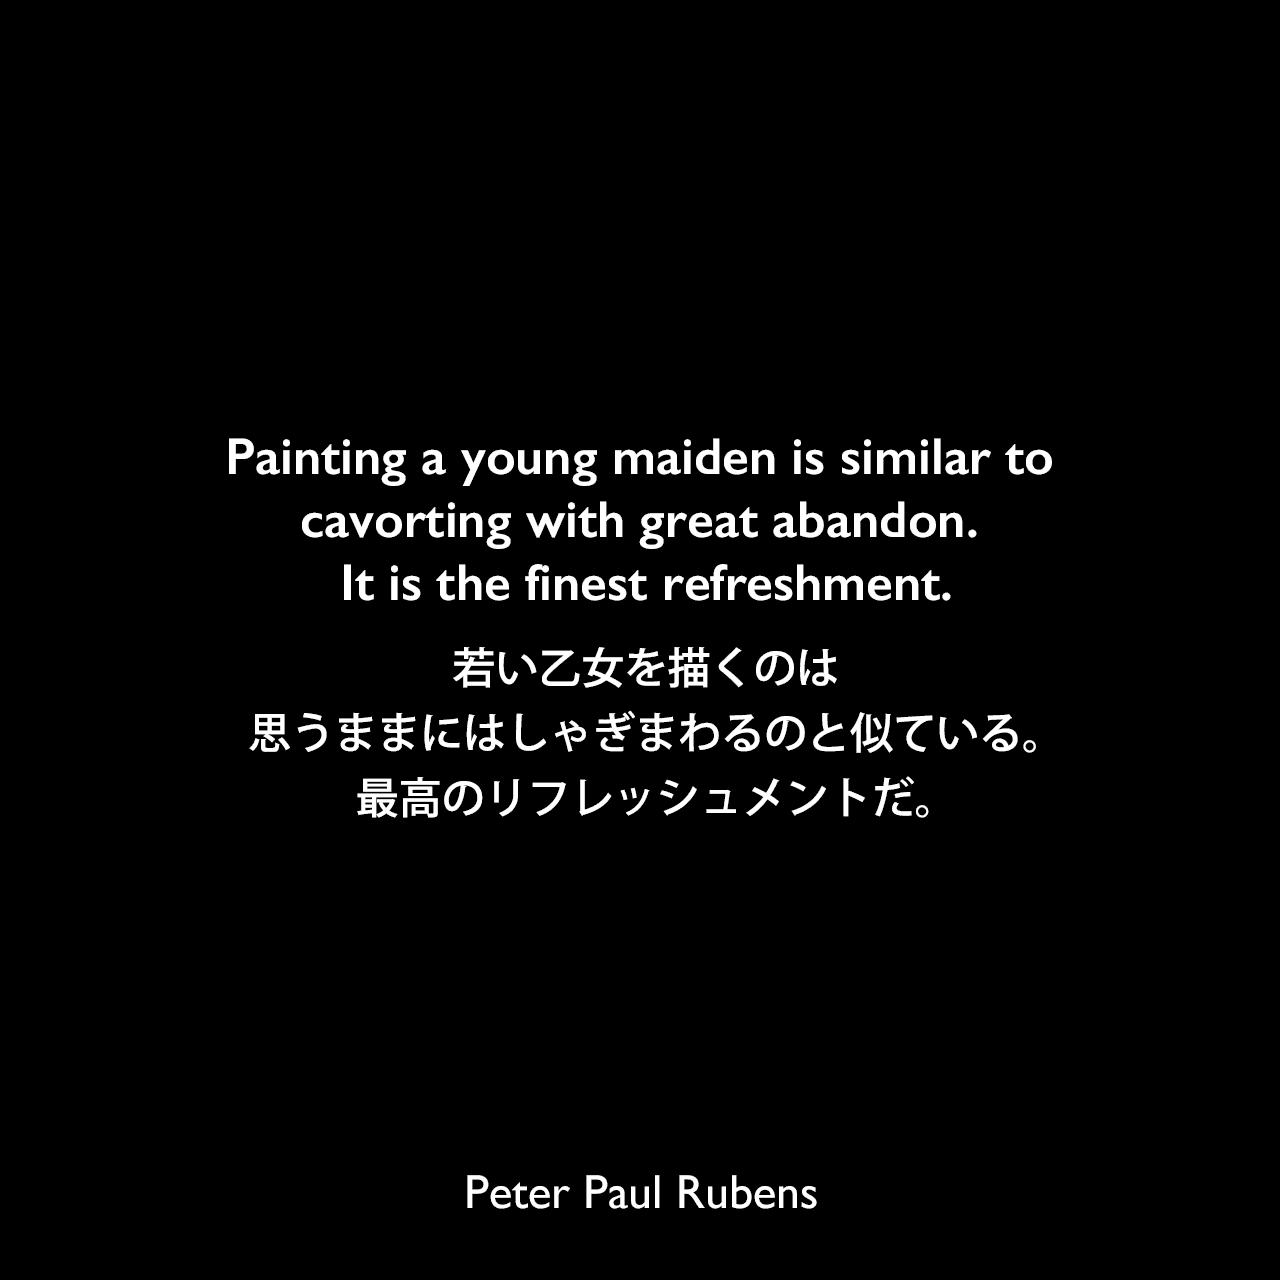 Painting a young maiden is similar to cavorting with great abandon. It is the finest refreshment.若い乙女を描くのは、思うままにはしゃぎまわるのと似ている。最高のリフレッシュメントだ。Peter Paul Rubens